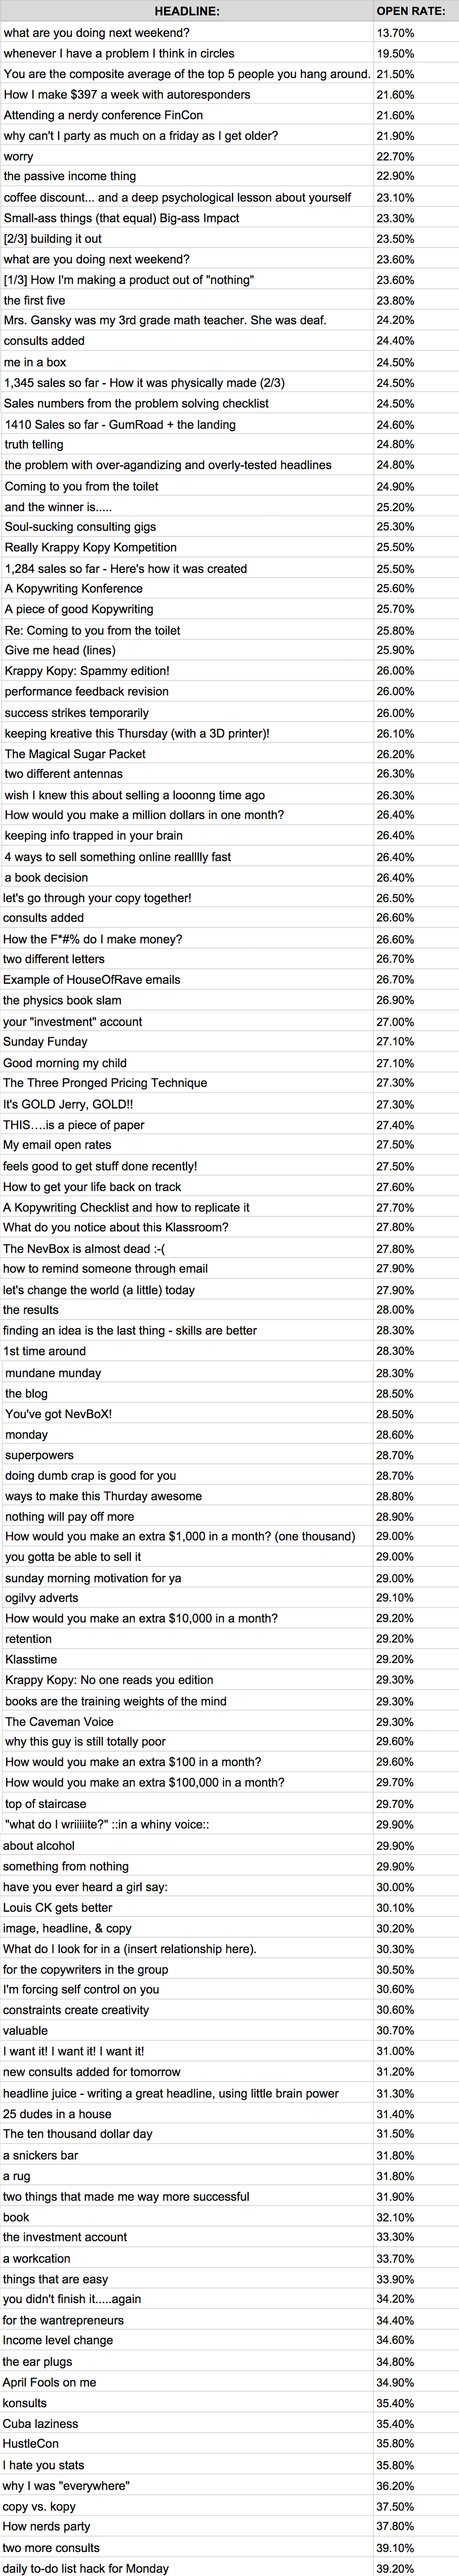 Headline Emails Open Rates